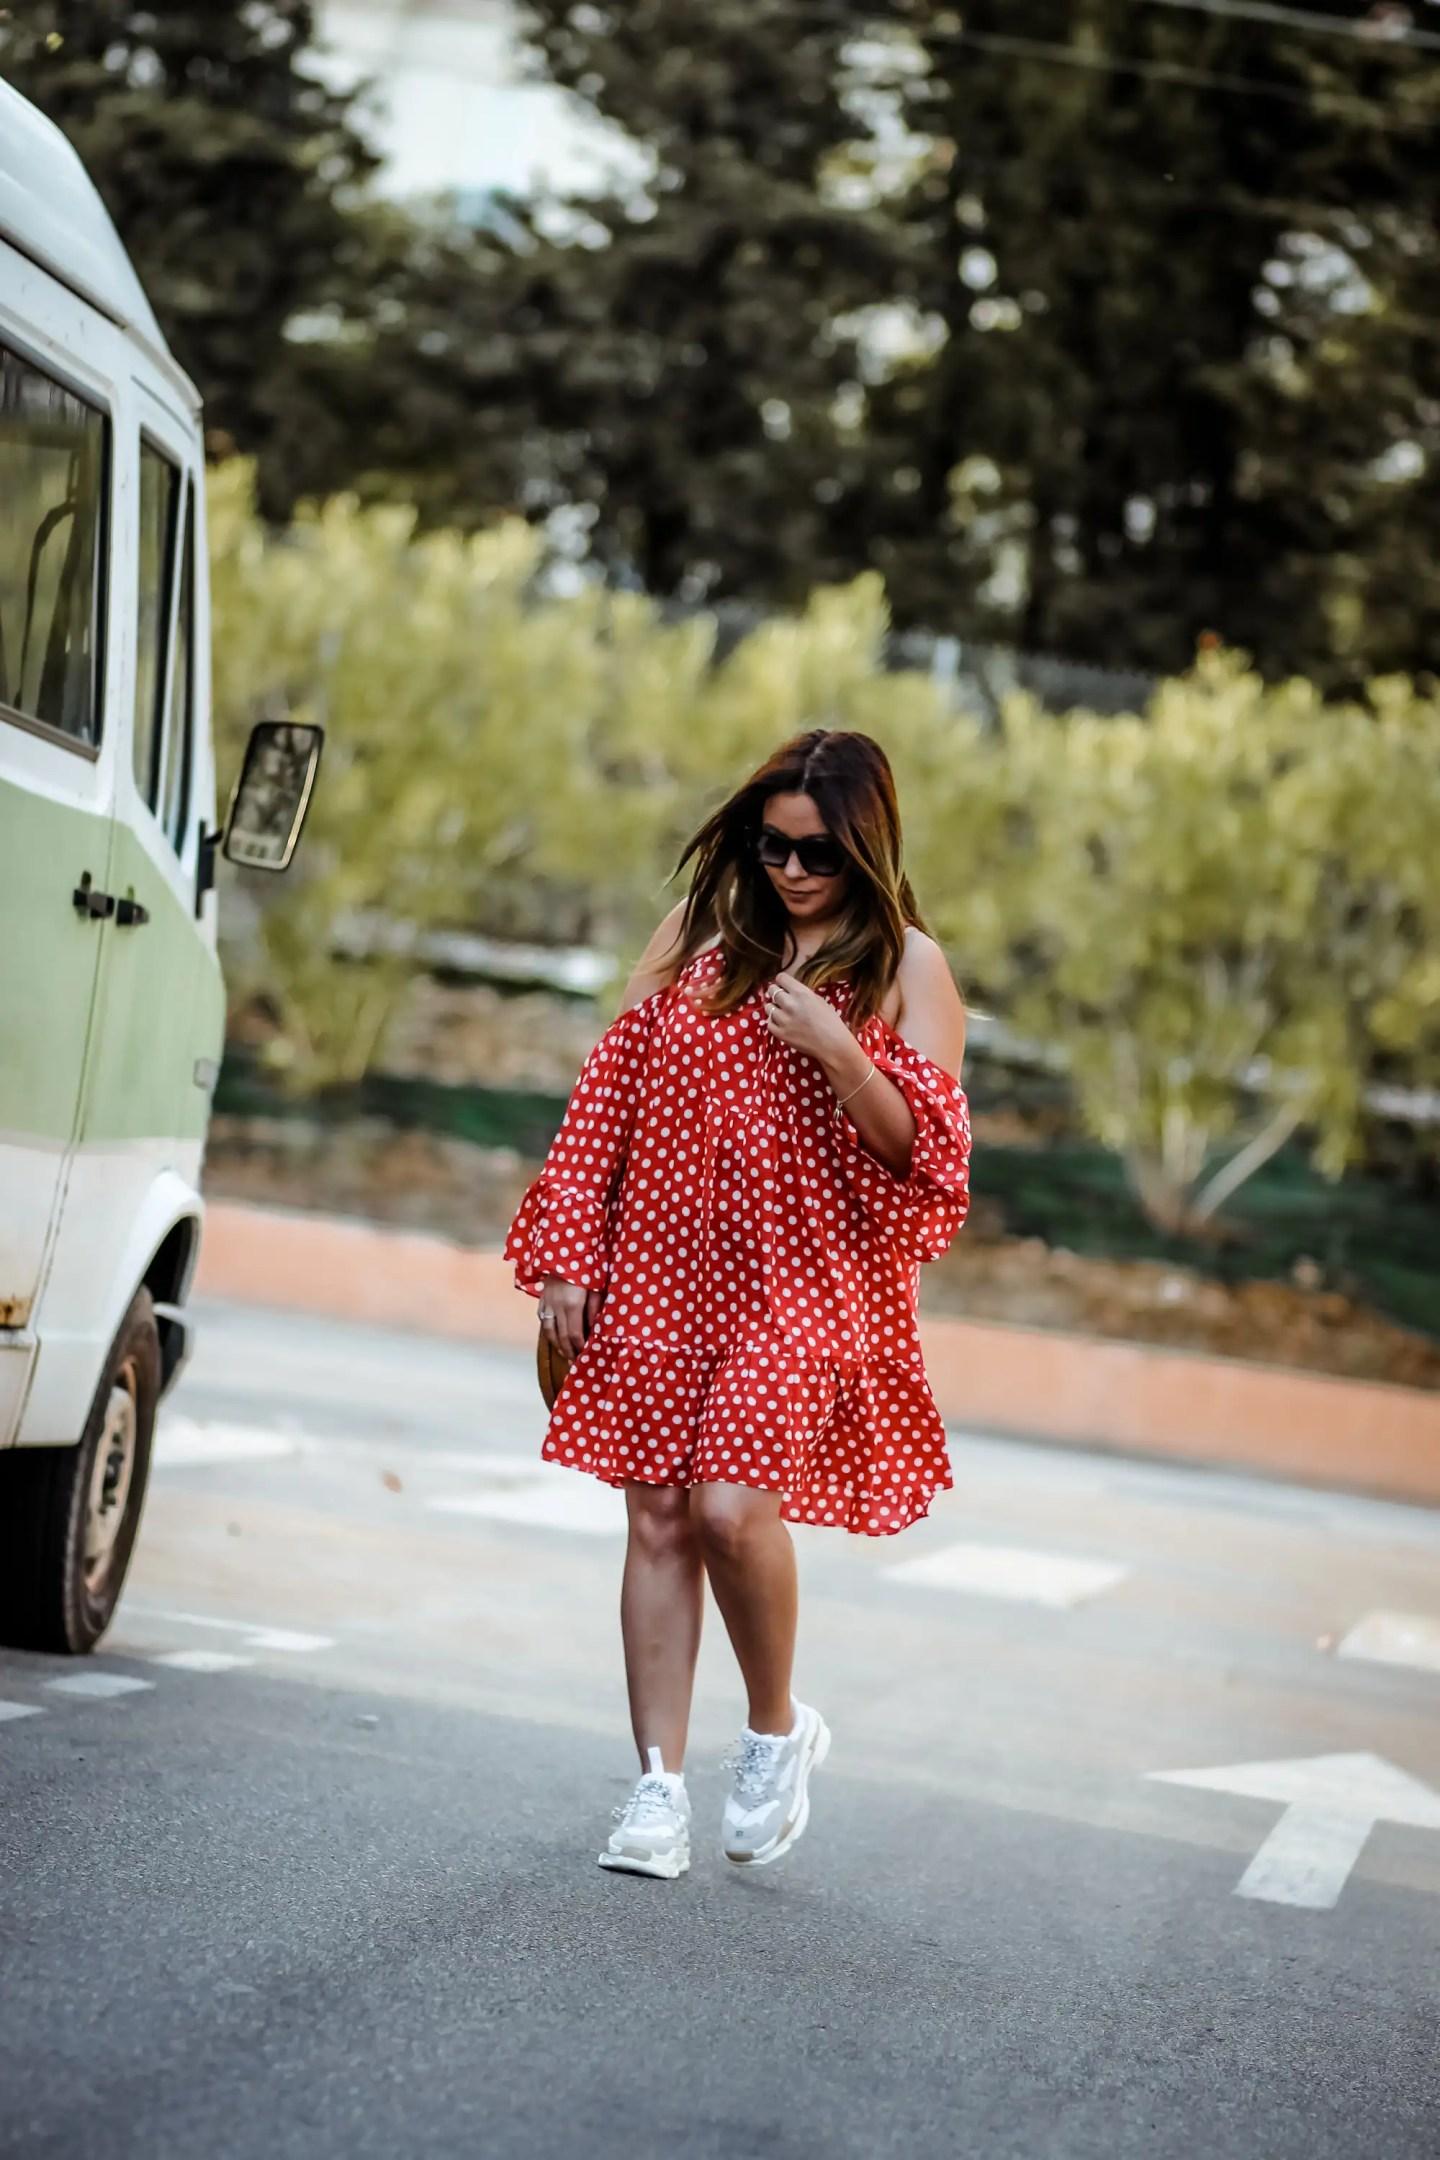 the grren anans, blog travel, polka dot dress, robe pois, blogueuse française, blogueuse influente, gypsy style, obvious sneakers, inspiration balanciaga, ugly shoes, dresslily, tularosa